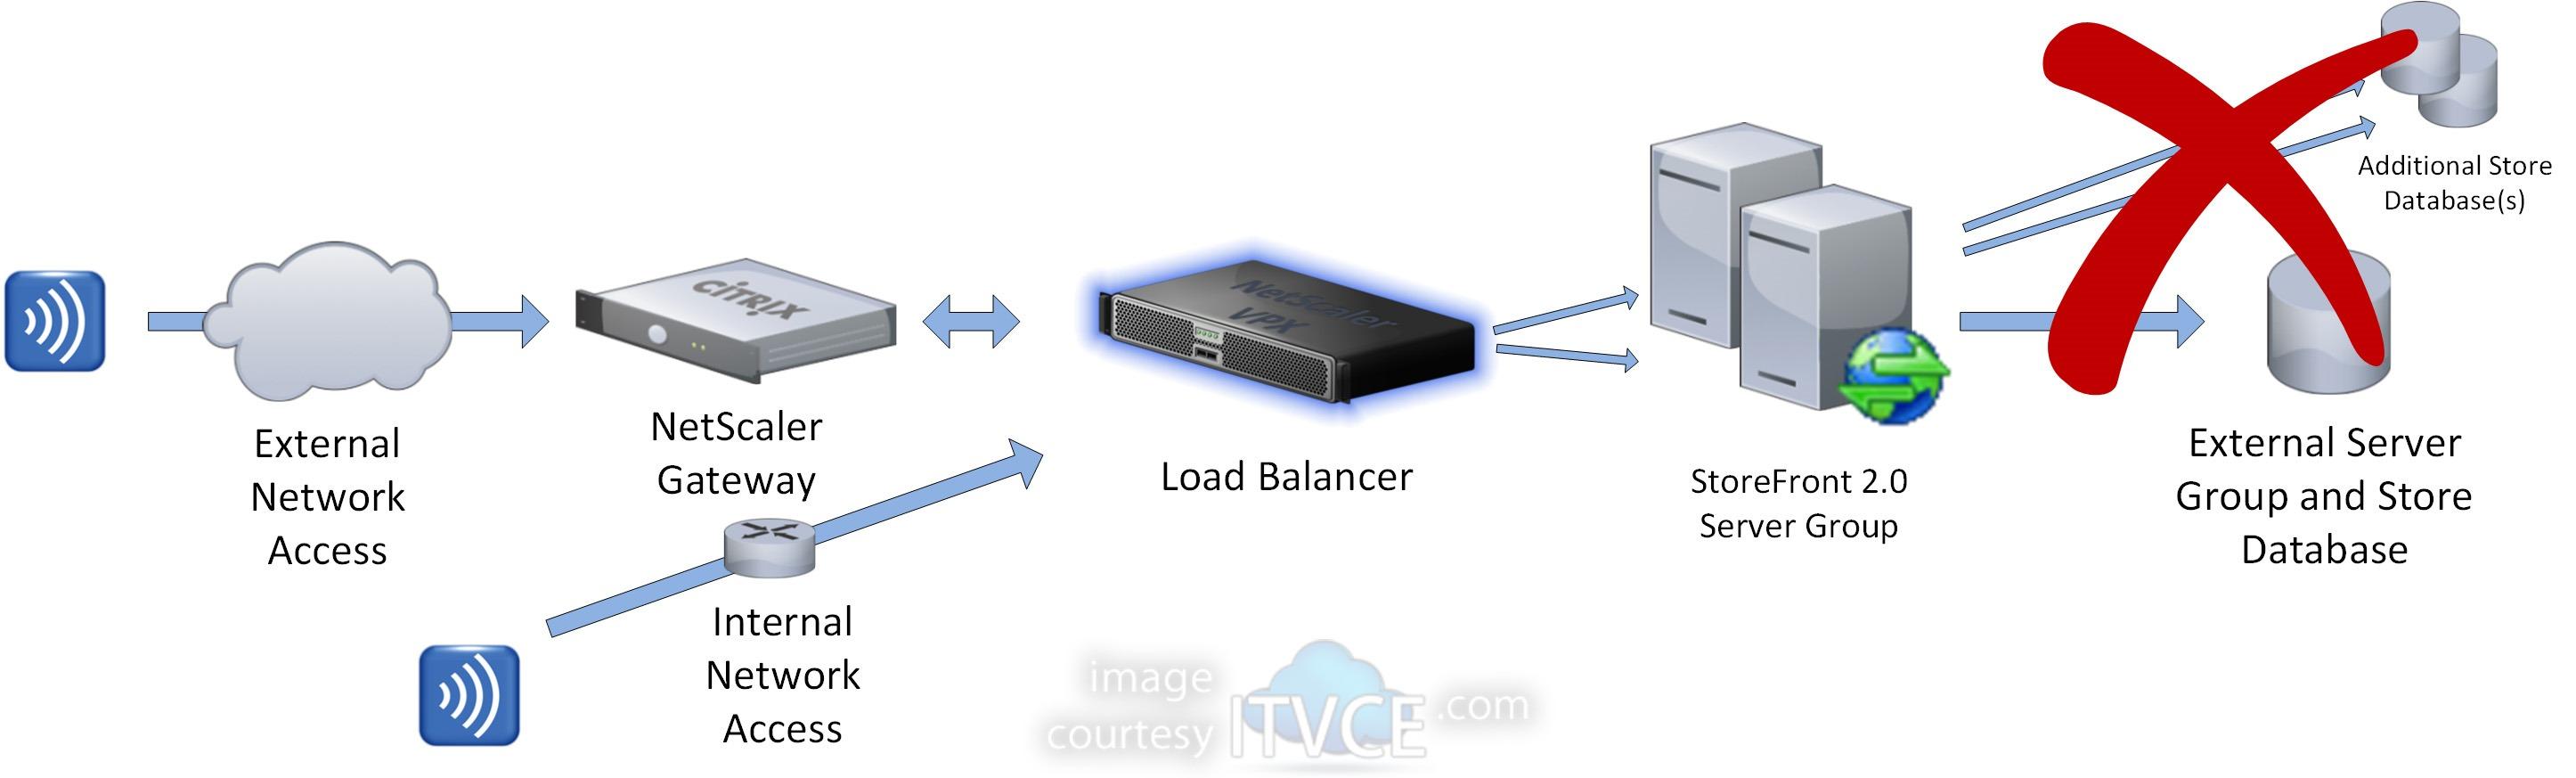 citrix netscaler diagram xlr mono jack wiring creating a load balanced multi node storefront 2 0 server group with gateway 10 1